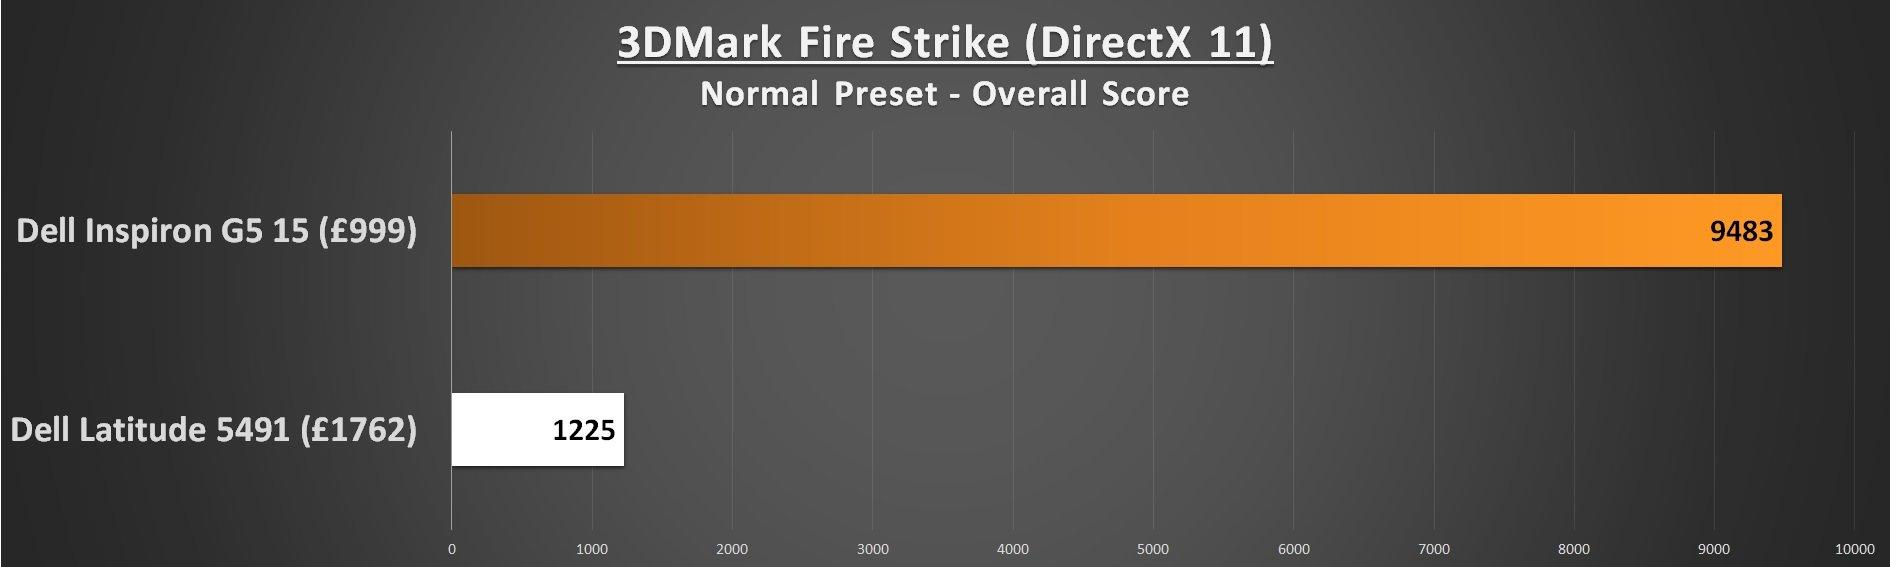 Dell Lattitude 5491 Performance 3DMark Fire Strike